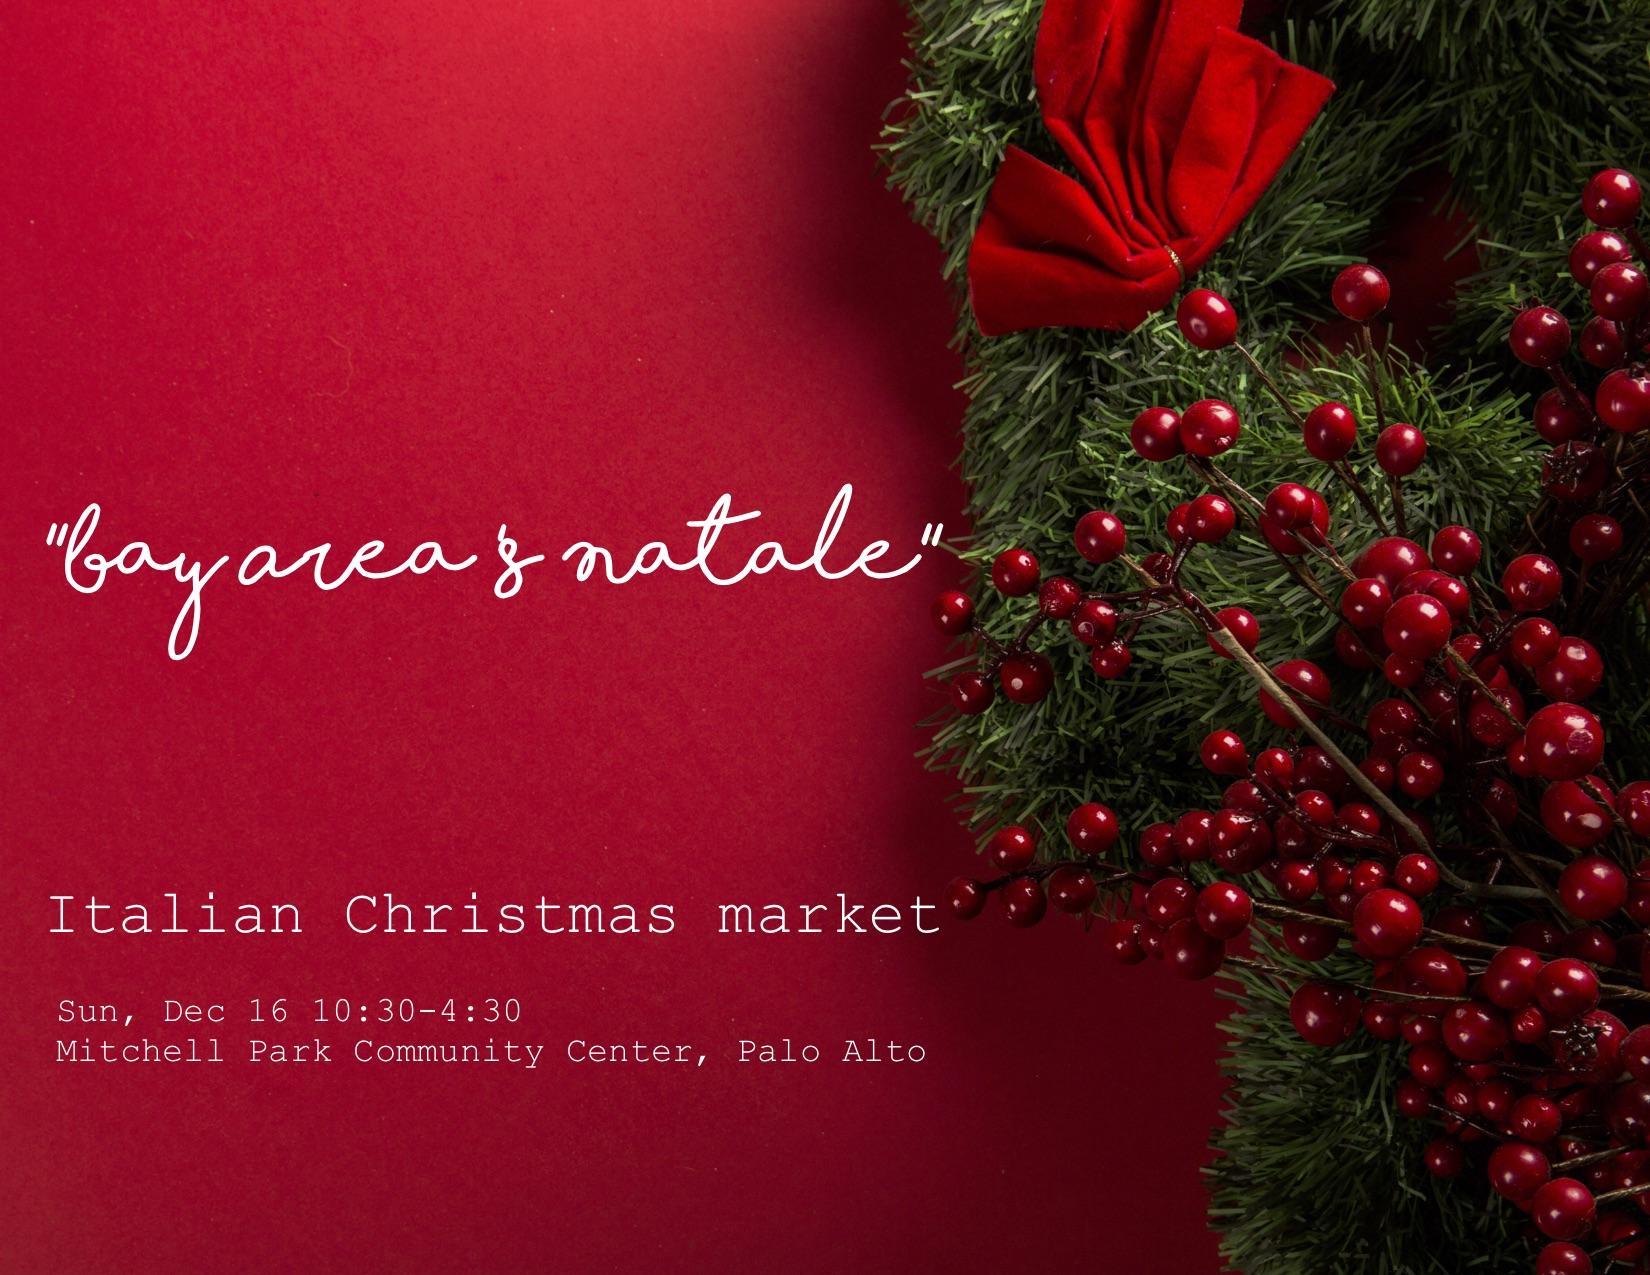 Italian Christmas.Bay Area S Natale Italian Christmas Market